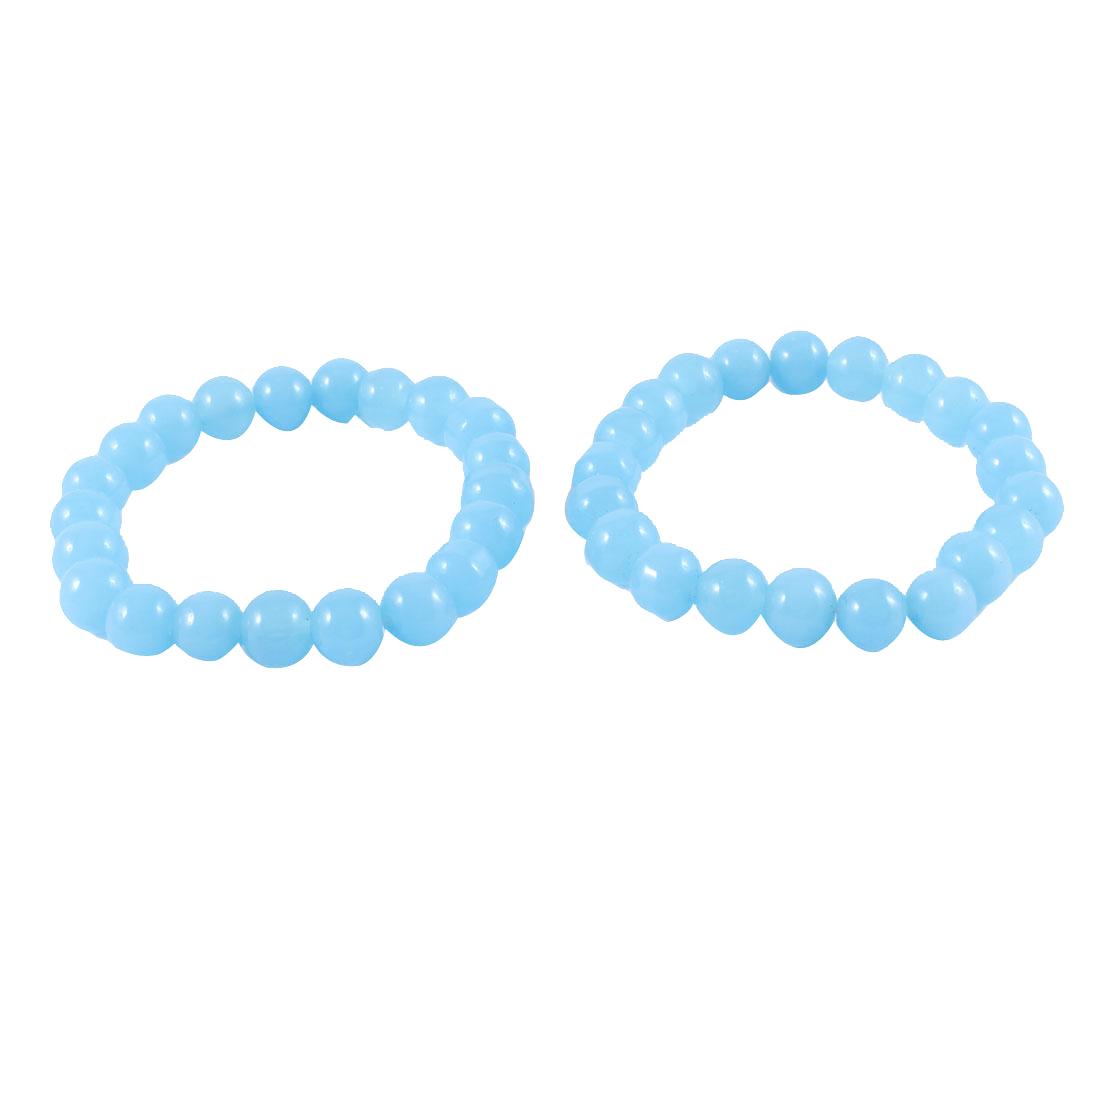 2 Pcs Lady 8 mm Dia Blue Round Plastic Beads Decor Elastic Bracelet